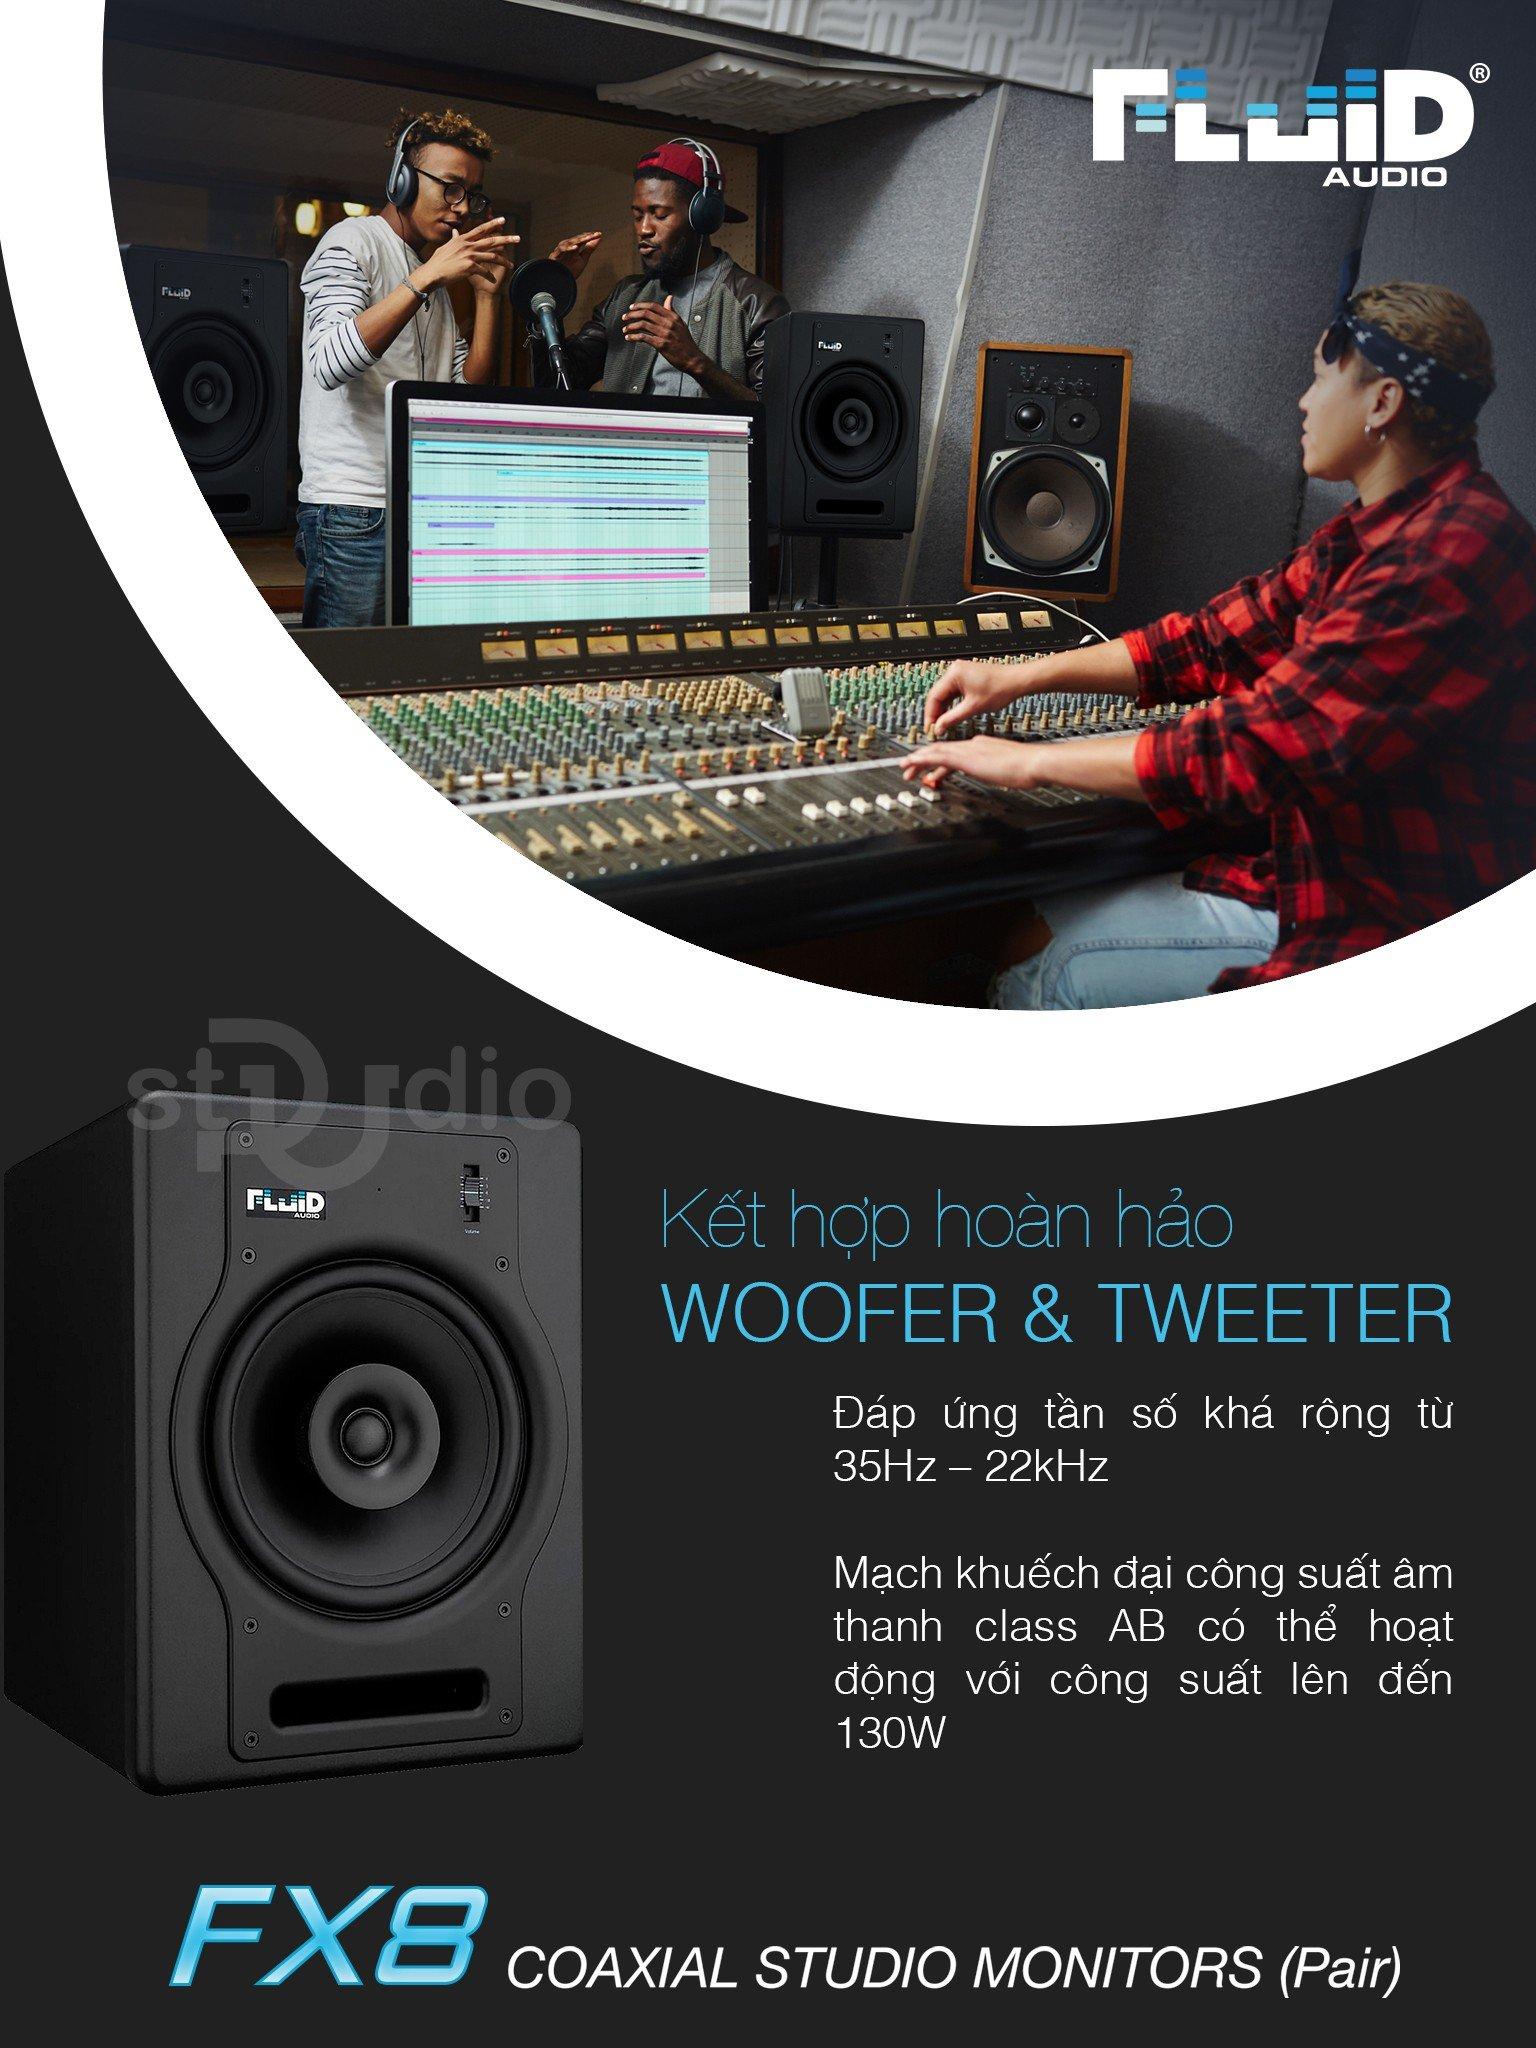 Loa kiểm âm FLUID AUDIO FX8, Monitor Studio